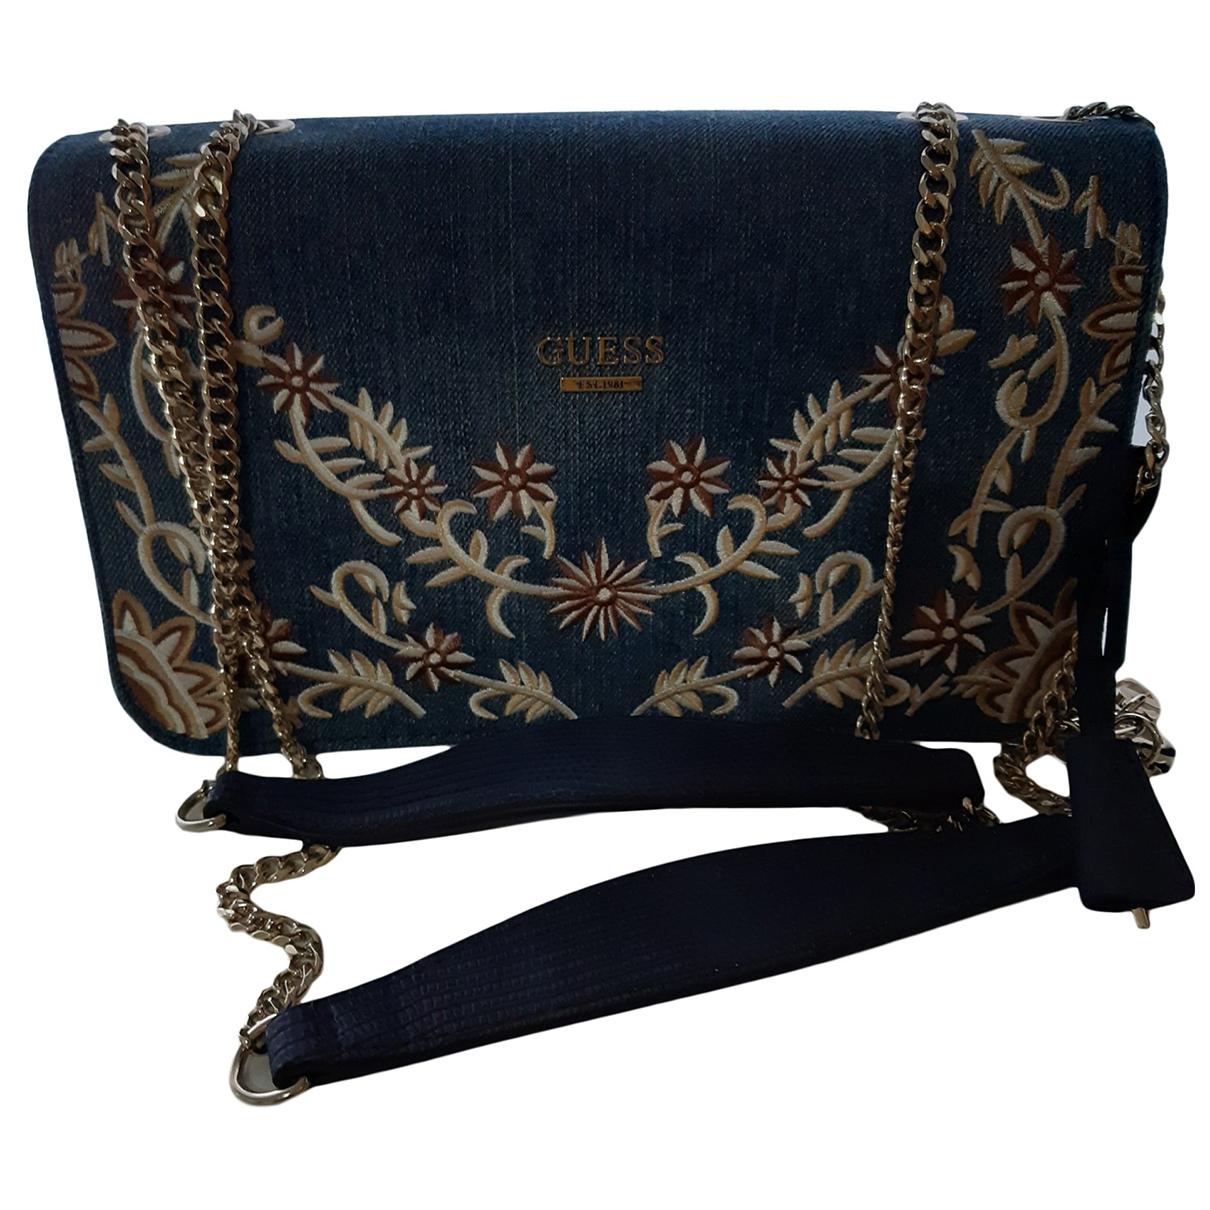 Guess \N Blue Denim - Jeans handbag for Women \N